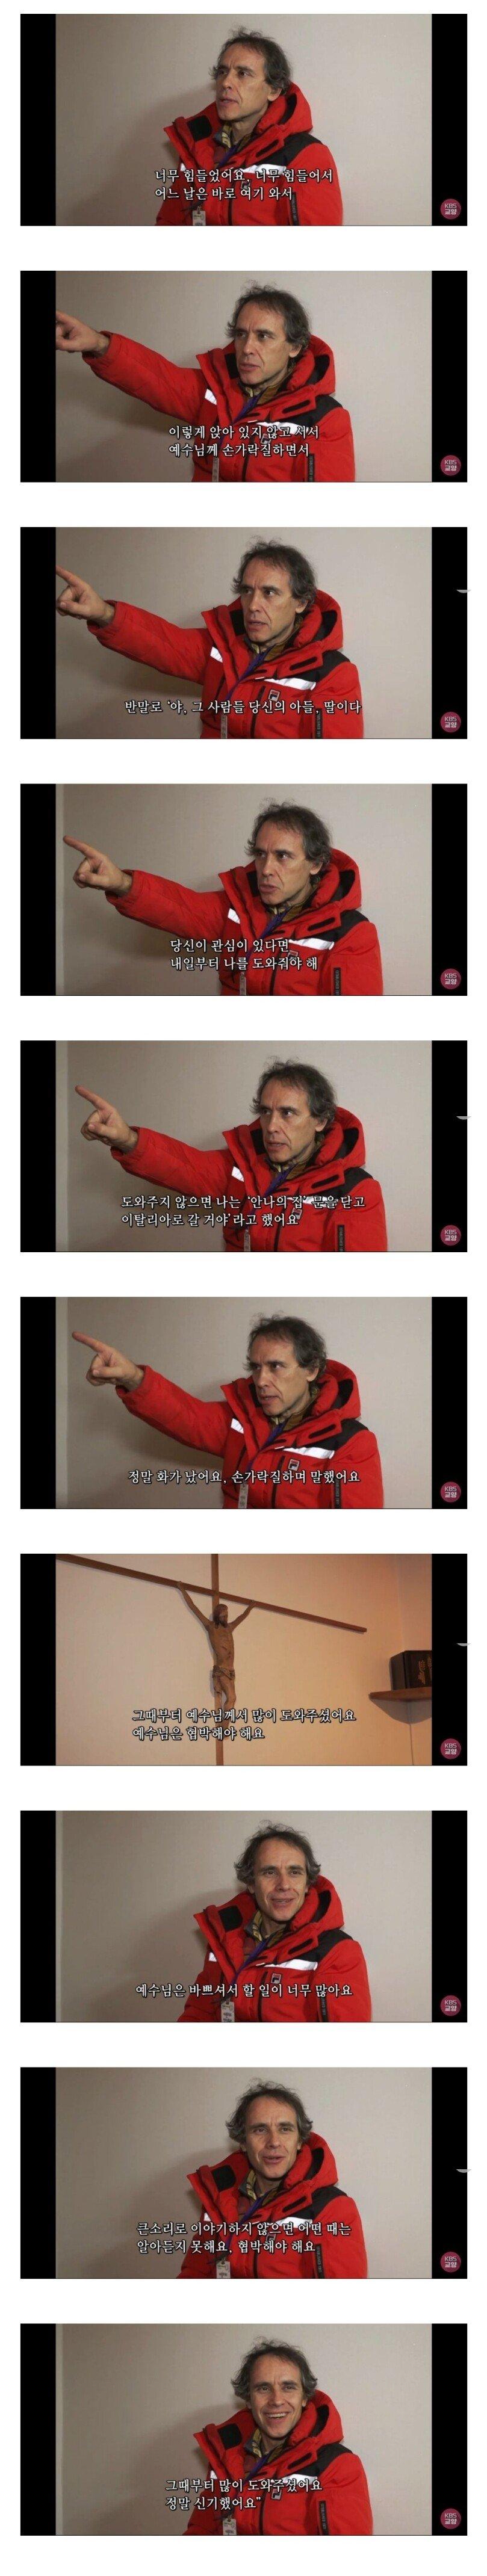 Screenshot_20210712-174352_Samsung Internet.jpg 신부 : 예수님은 협박해야 말 잘 들어.